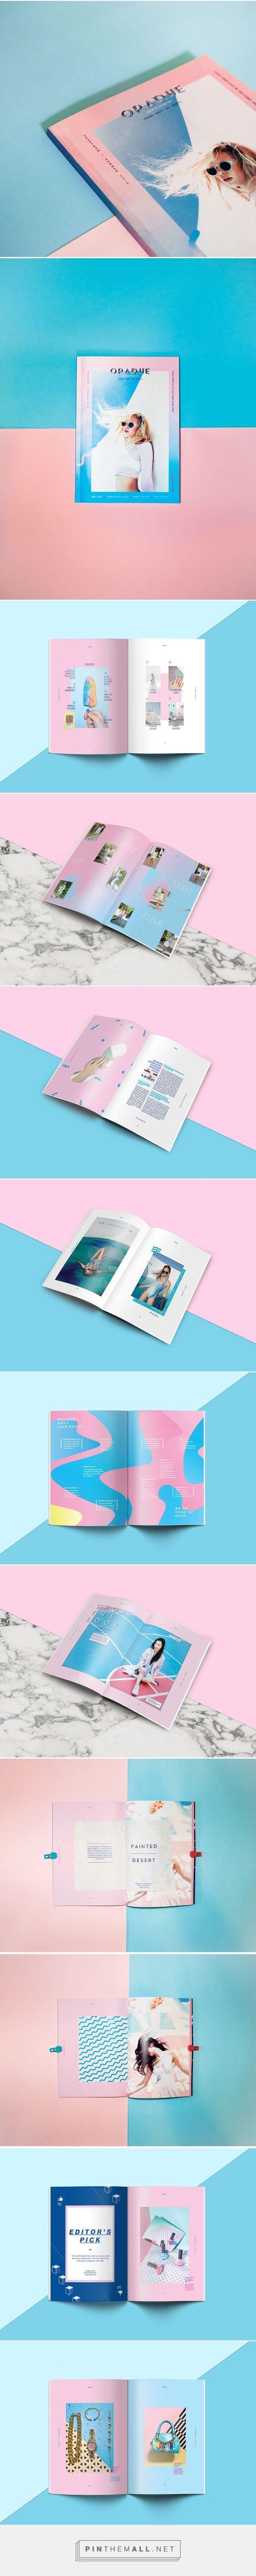 Magazine design: OPAQUE by Widya Widya